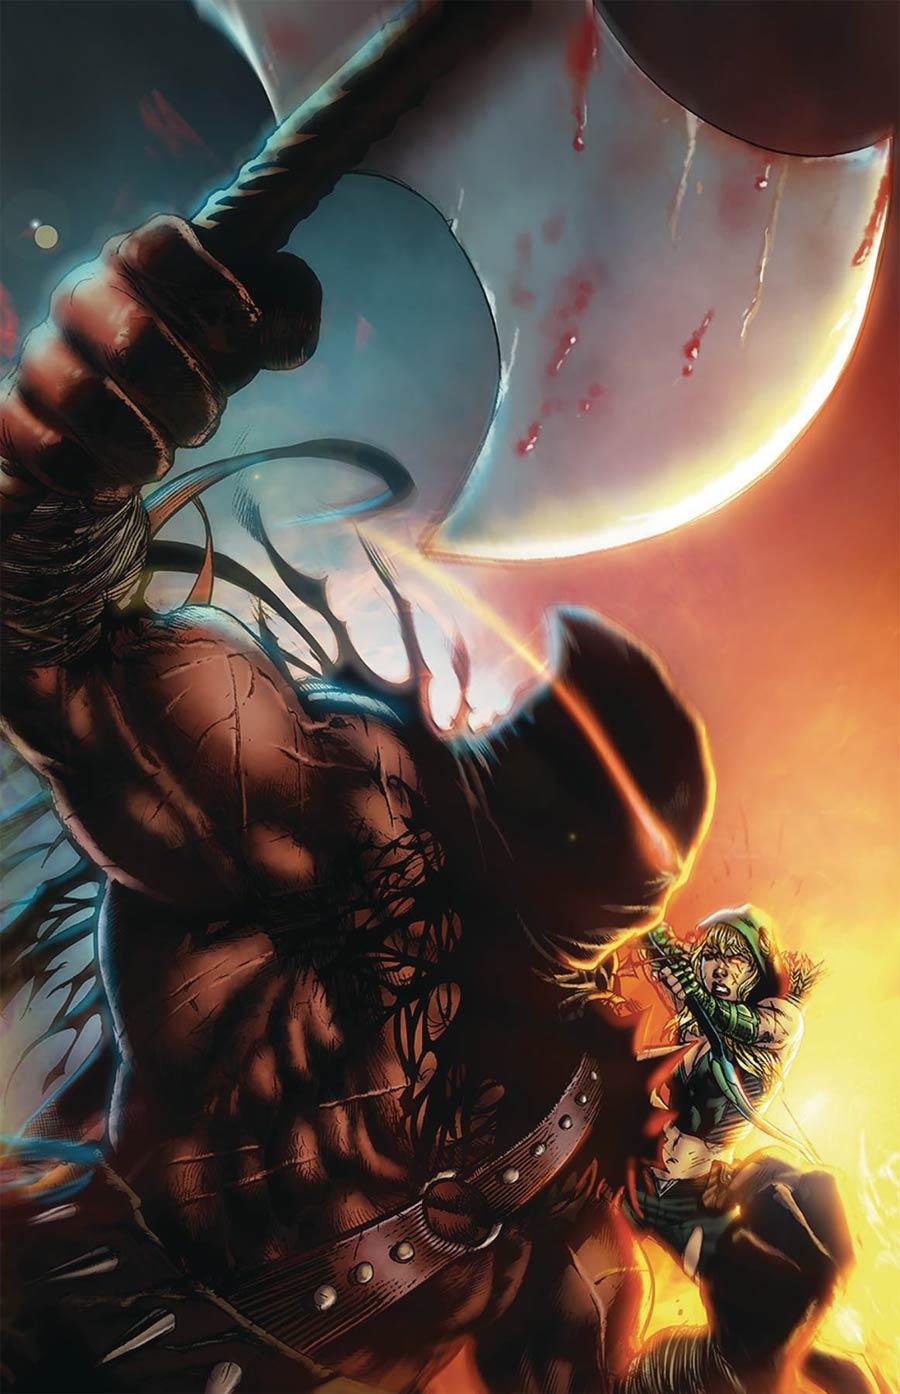 Grimm Fairy Tales Presents Robyn Hood The Hunt #6 Cover B Netho Diaz